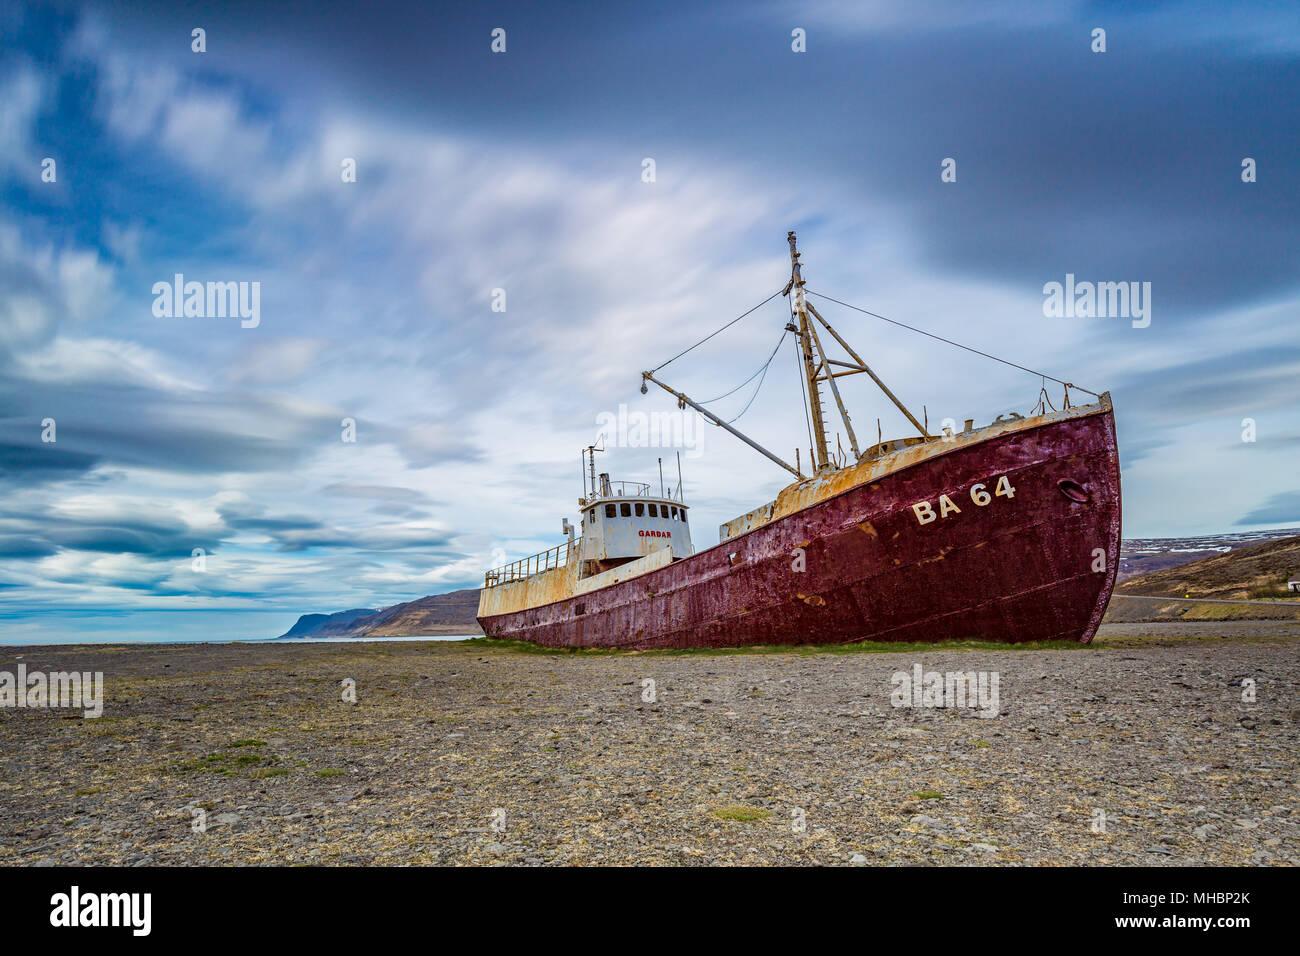 Gardar BA 64 ship wreck in Patrekfjordur, Westfjords, Iceland Stock